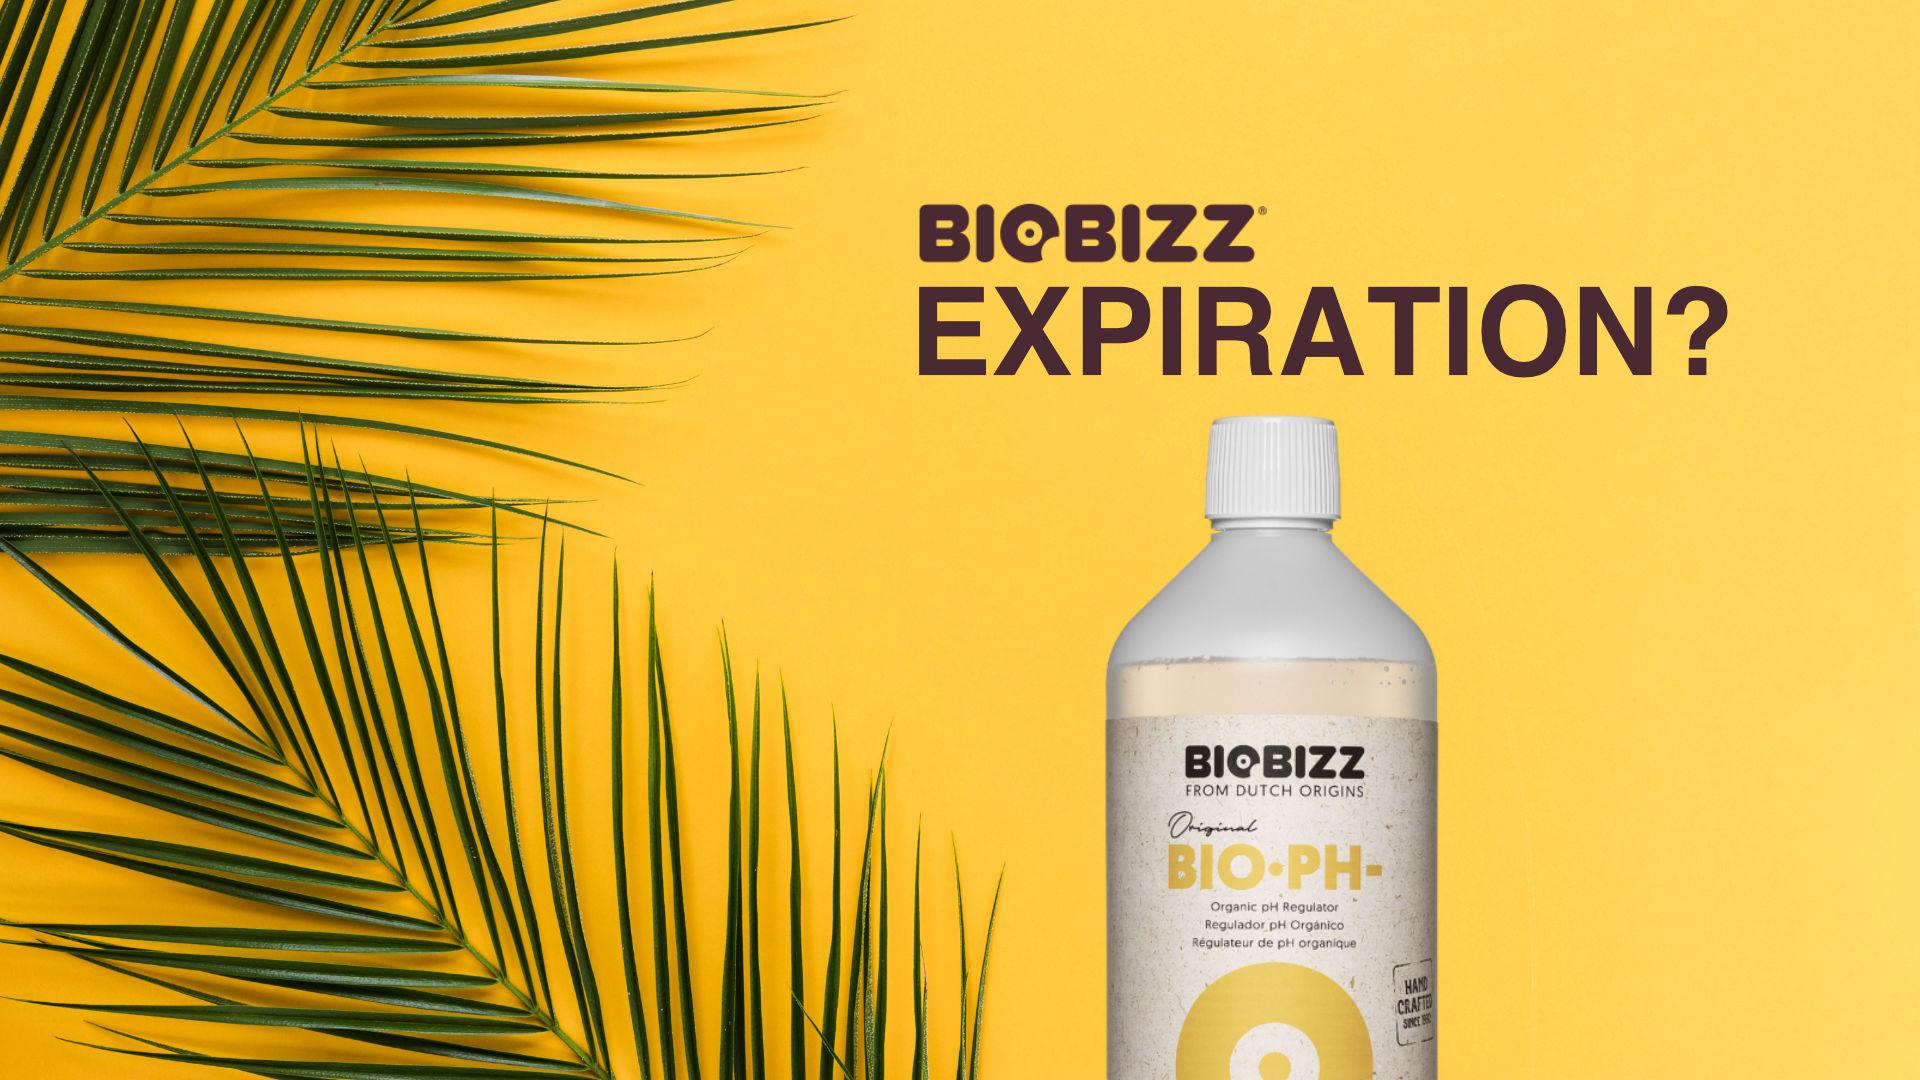 Biobizz Instructions - Production and Expiration Dates